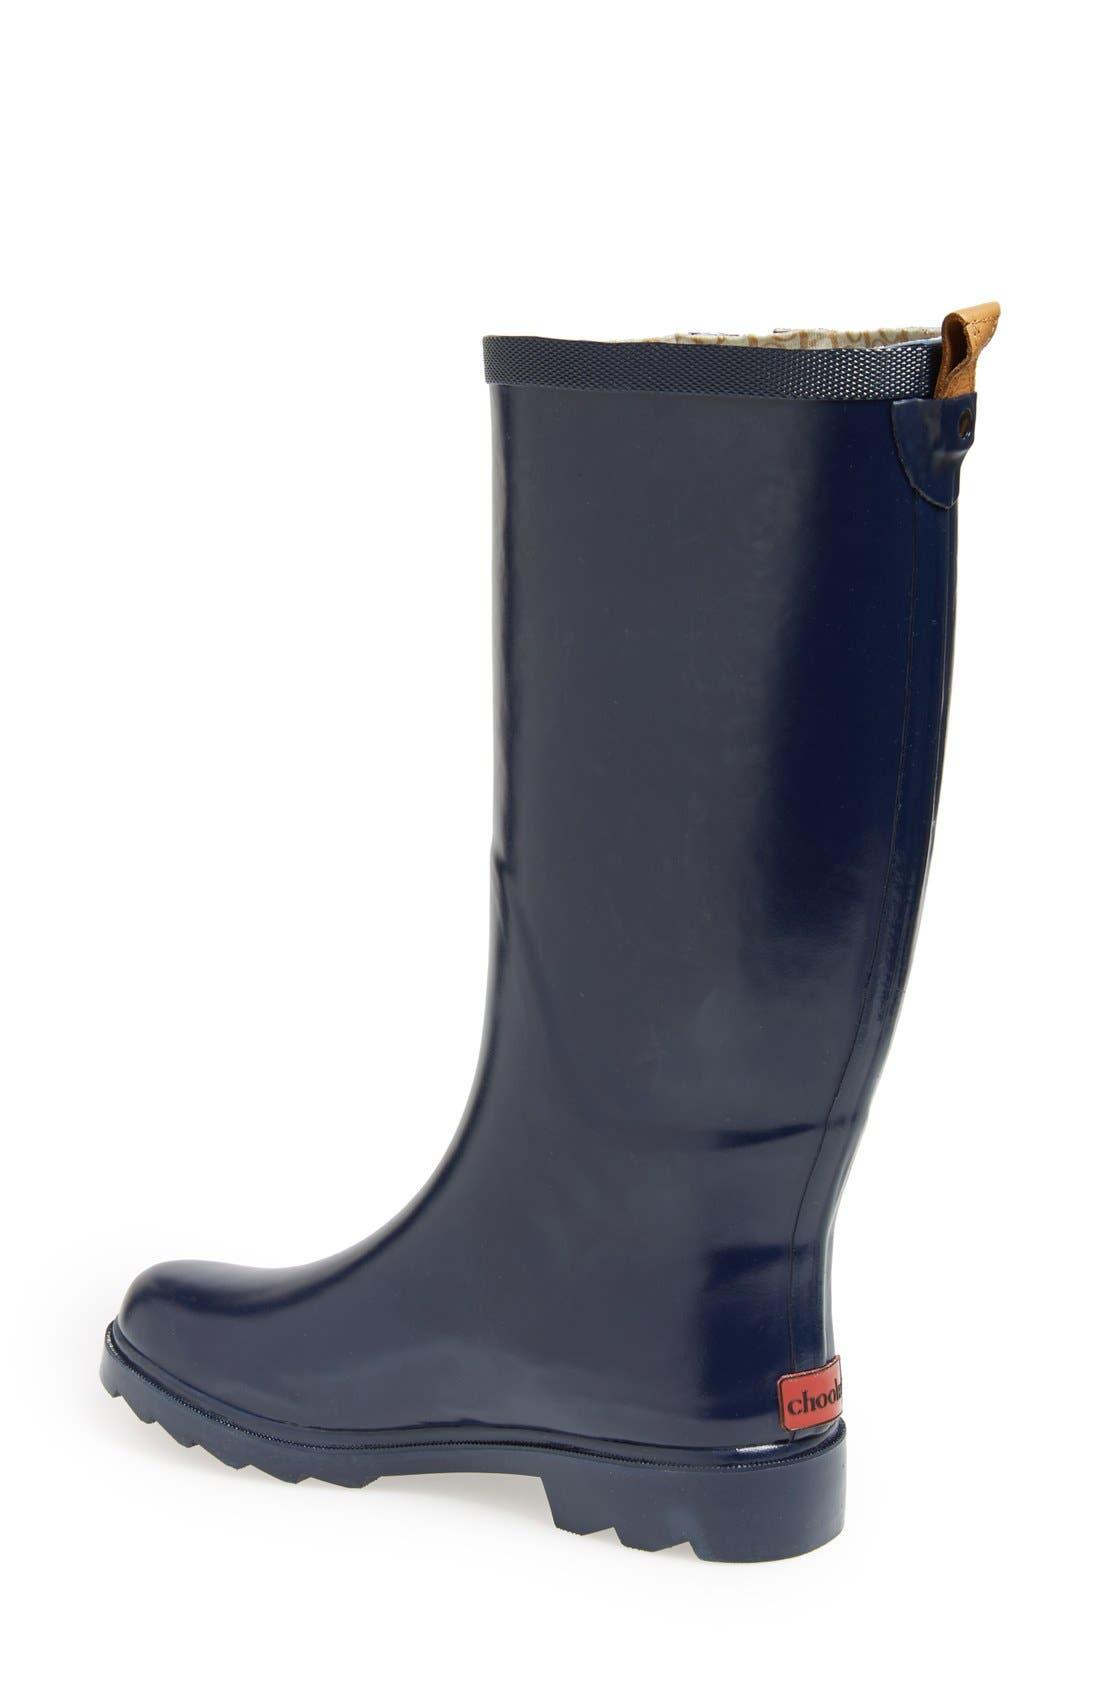 Alternate Image 2  - Chooka 'Top Solid' Rain Boot (Women)